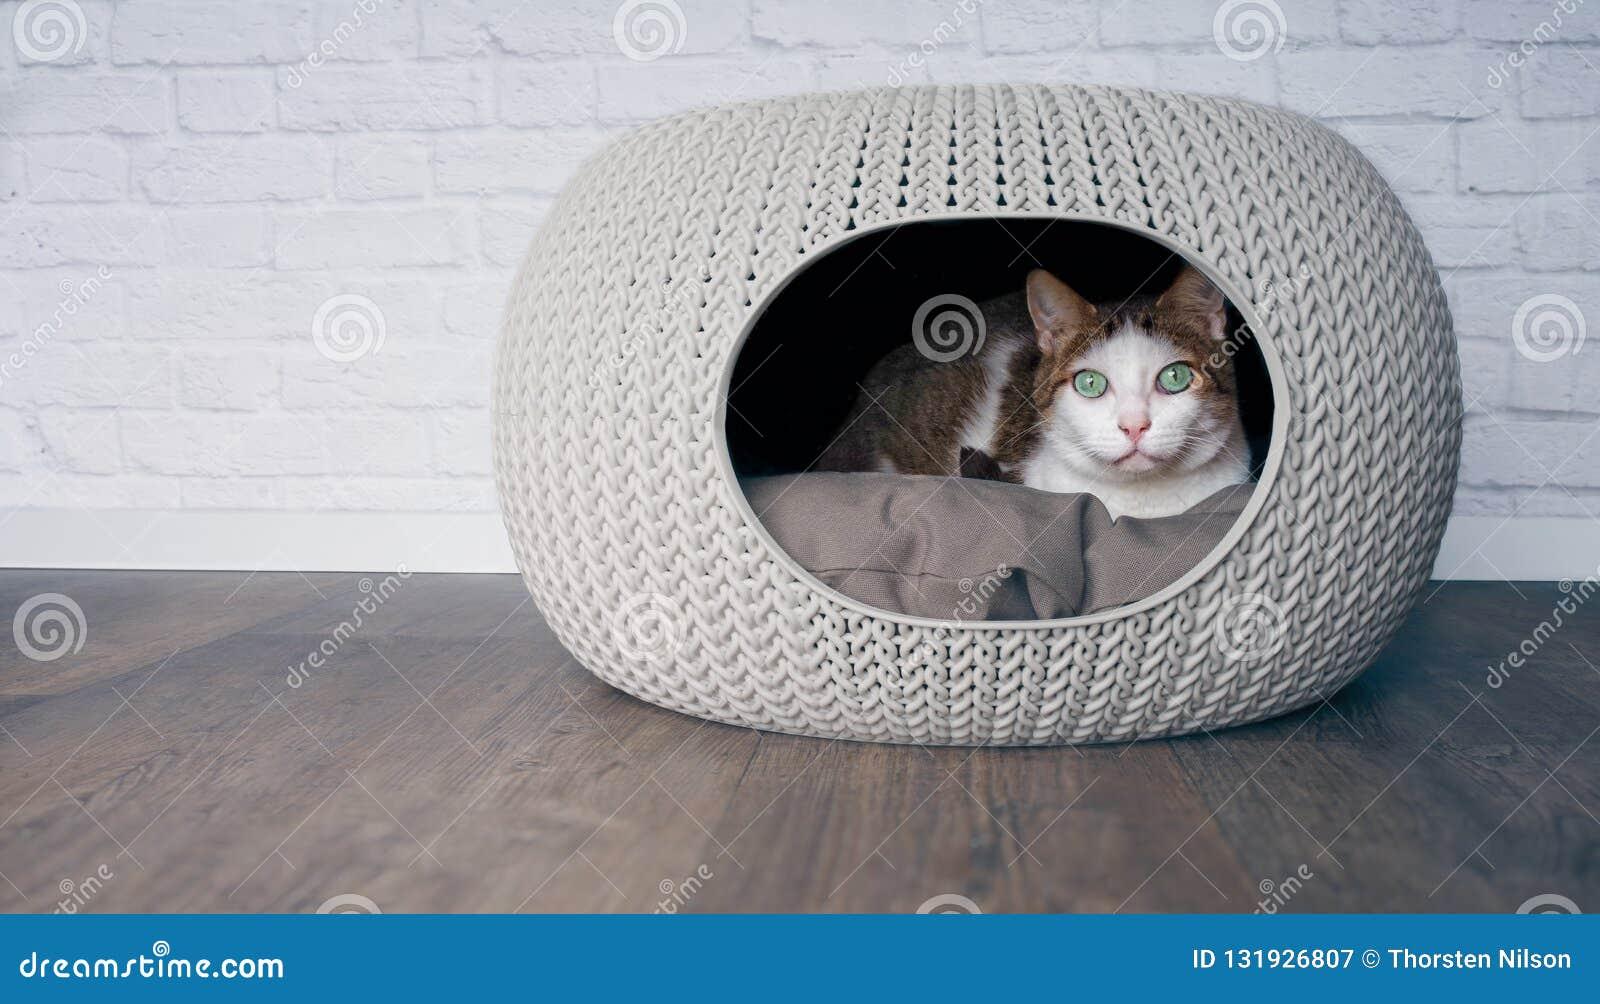 Cute tabby cat lying in a cat cave.